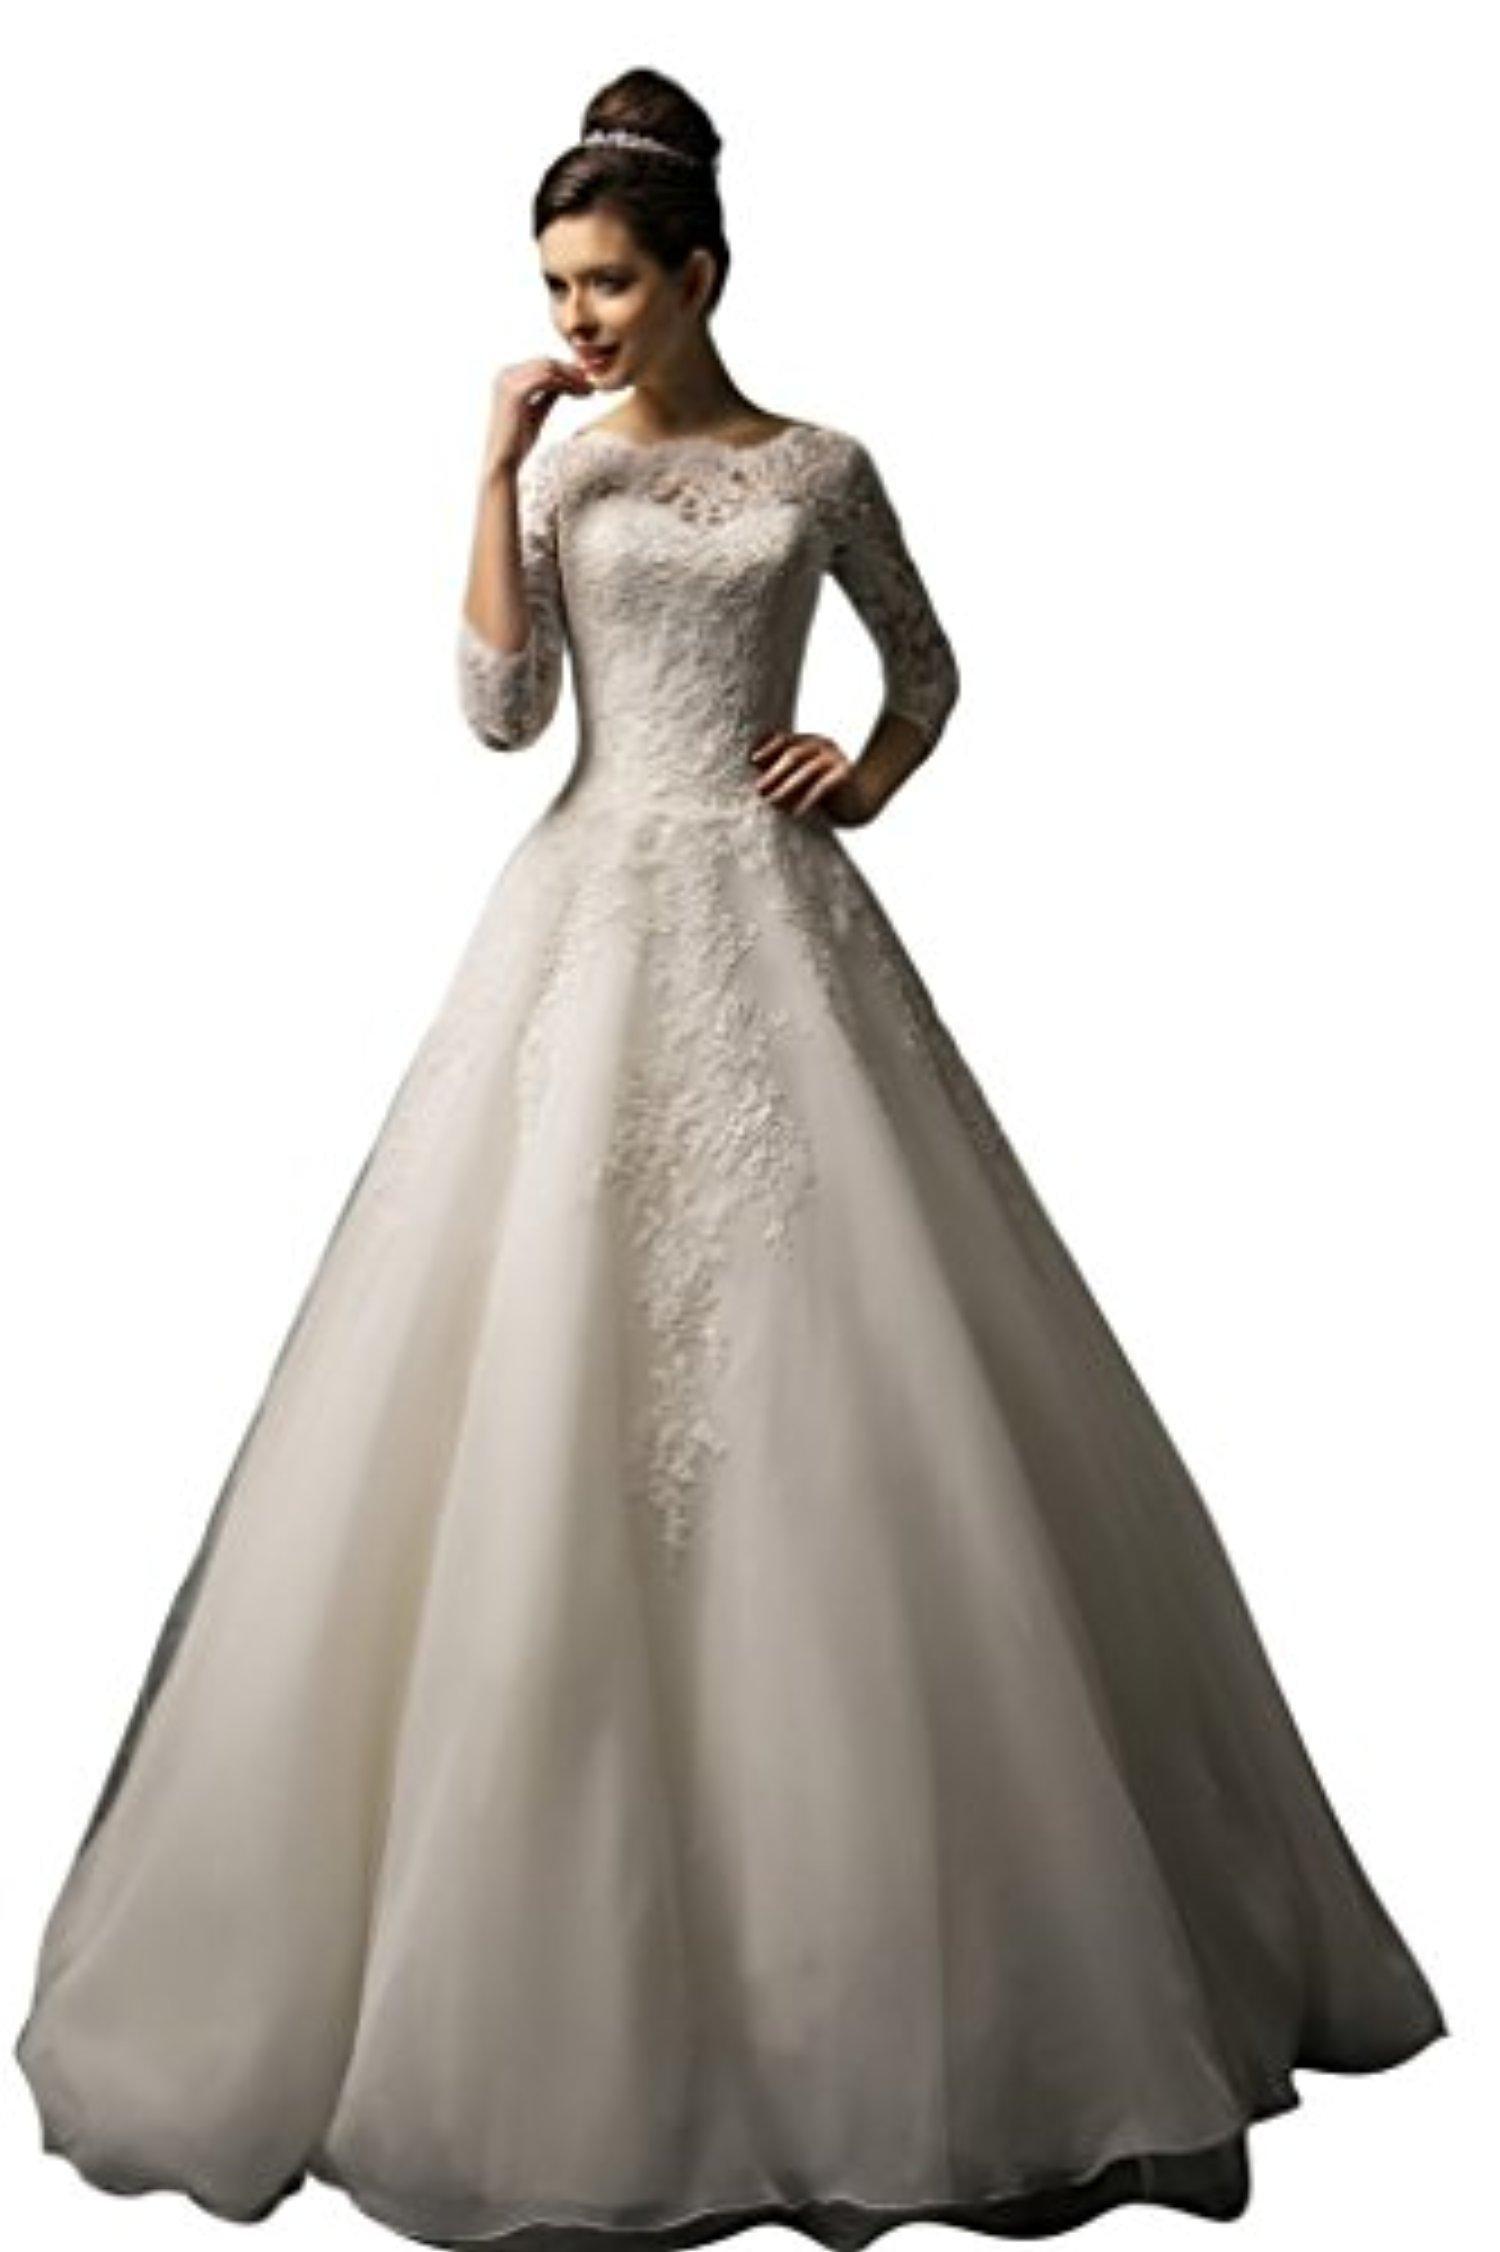 JoyVany Long Sleeve Wedding Dresses 2016 Organza Lace A-Line Bridal Wedding Gown Ivory Size 22W